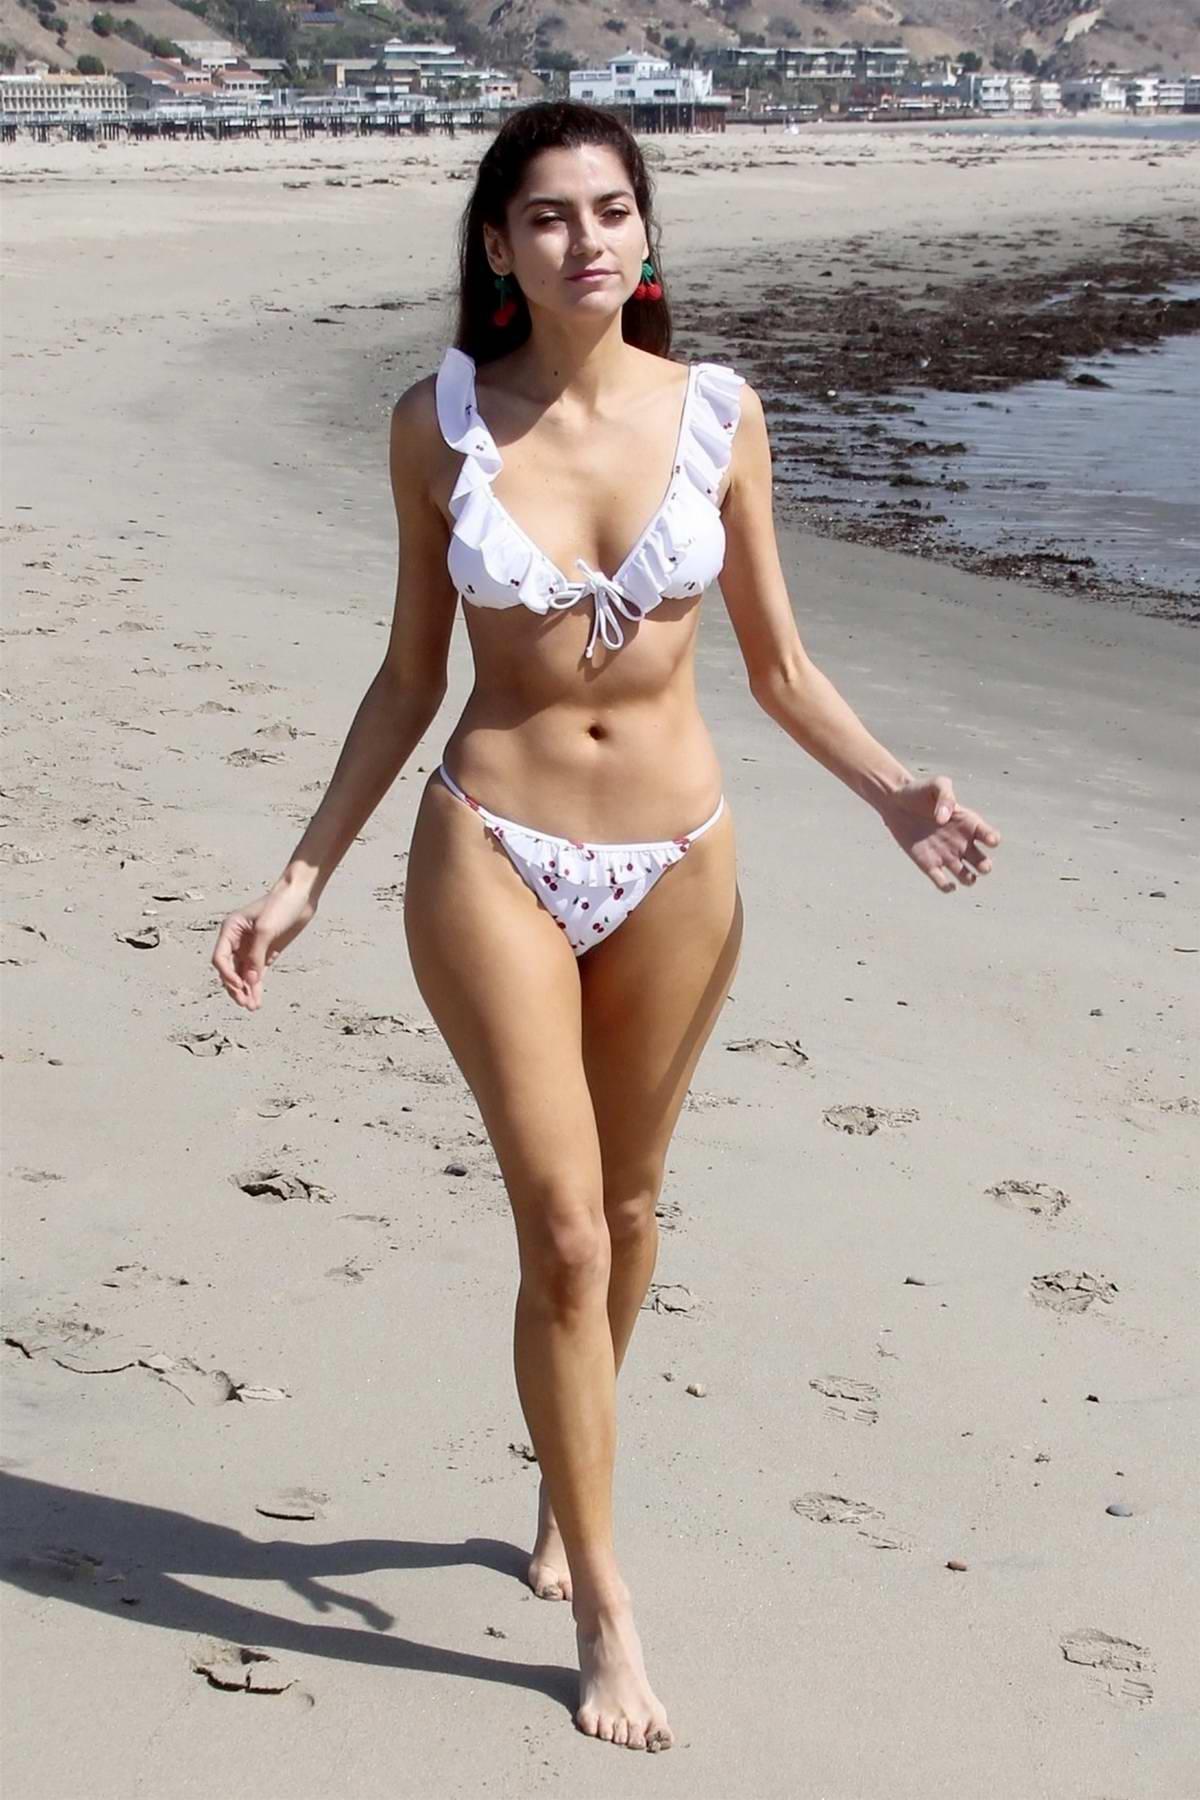 Rita Ora Relaxes in a Bikini by the Pool in France: Photo